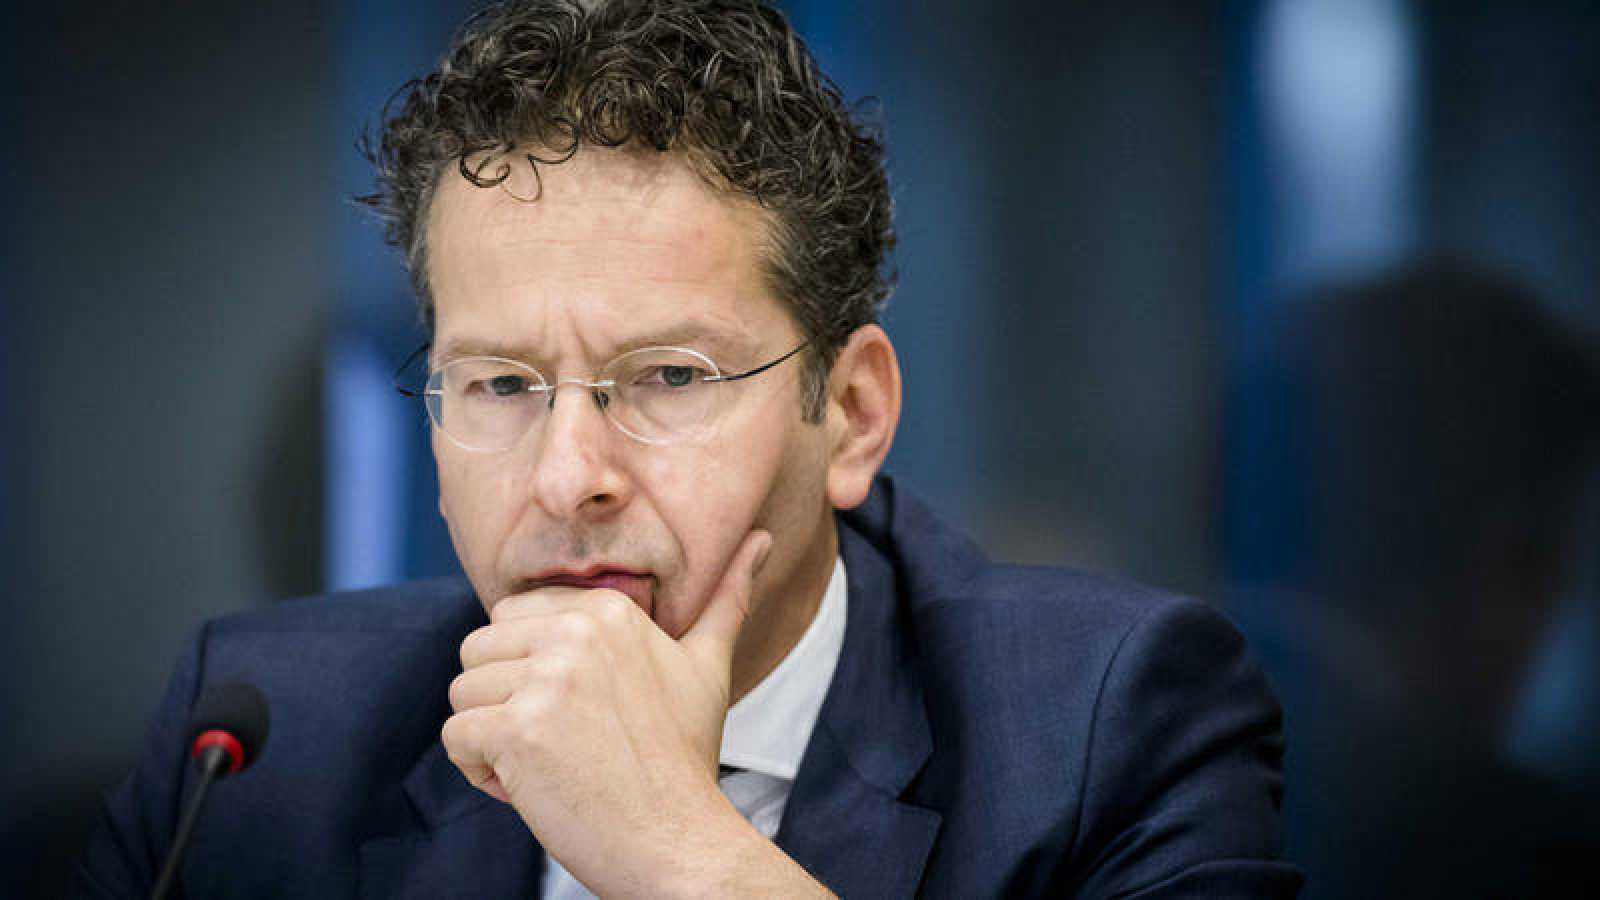 El presidente del Eurogrupo, Jeroen Dijsselbloem, en una imagen de archivo